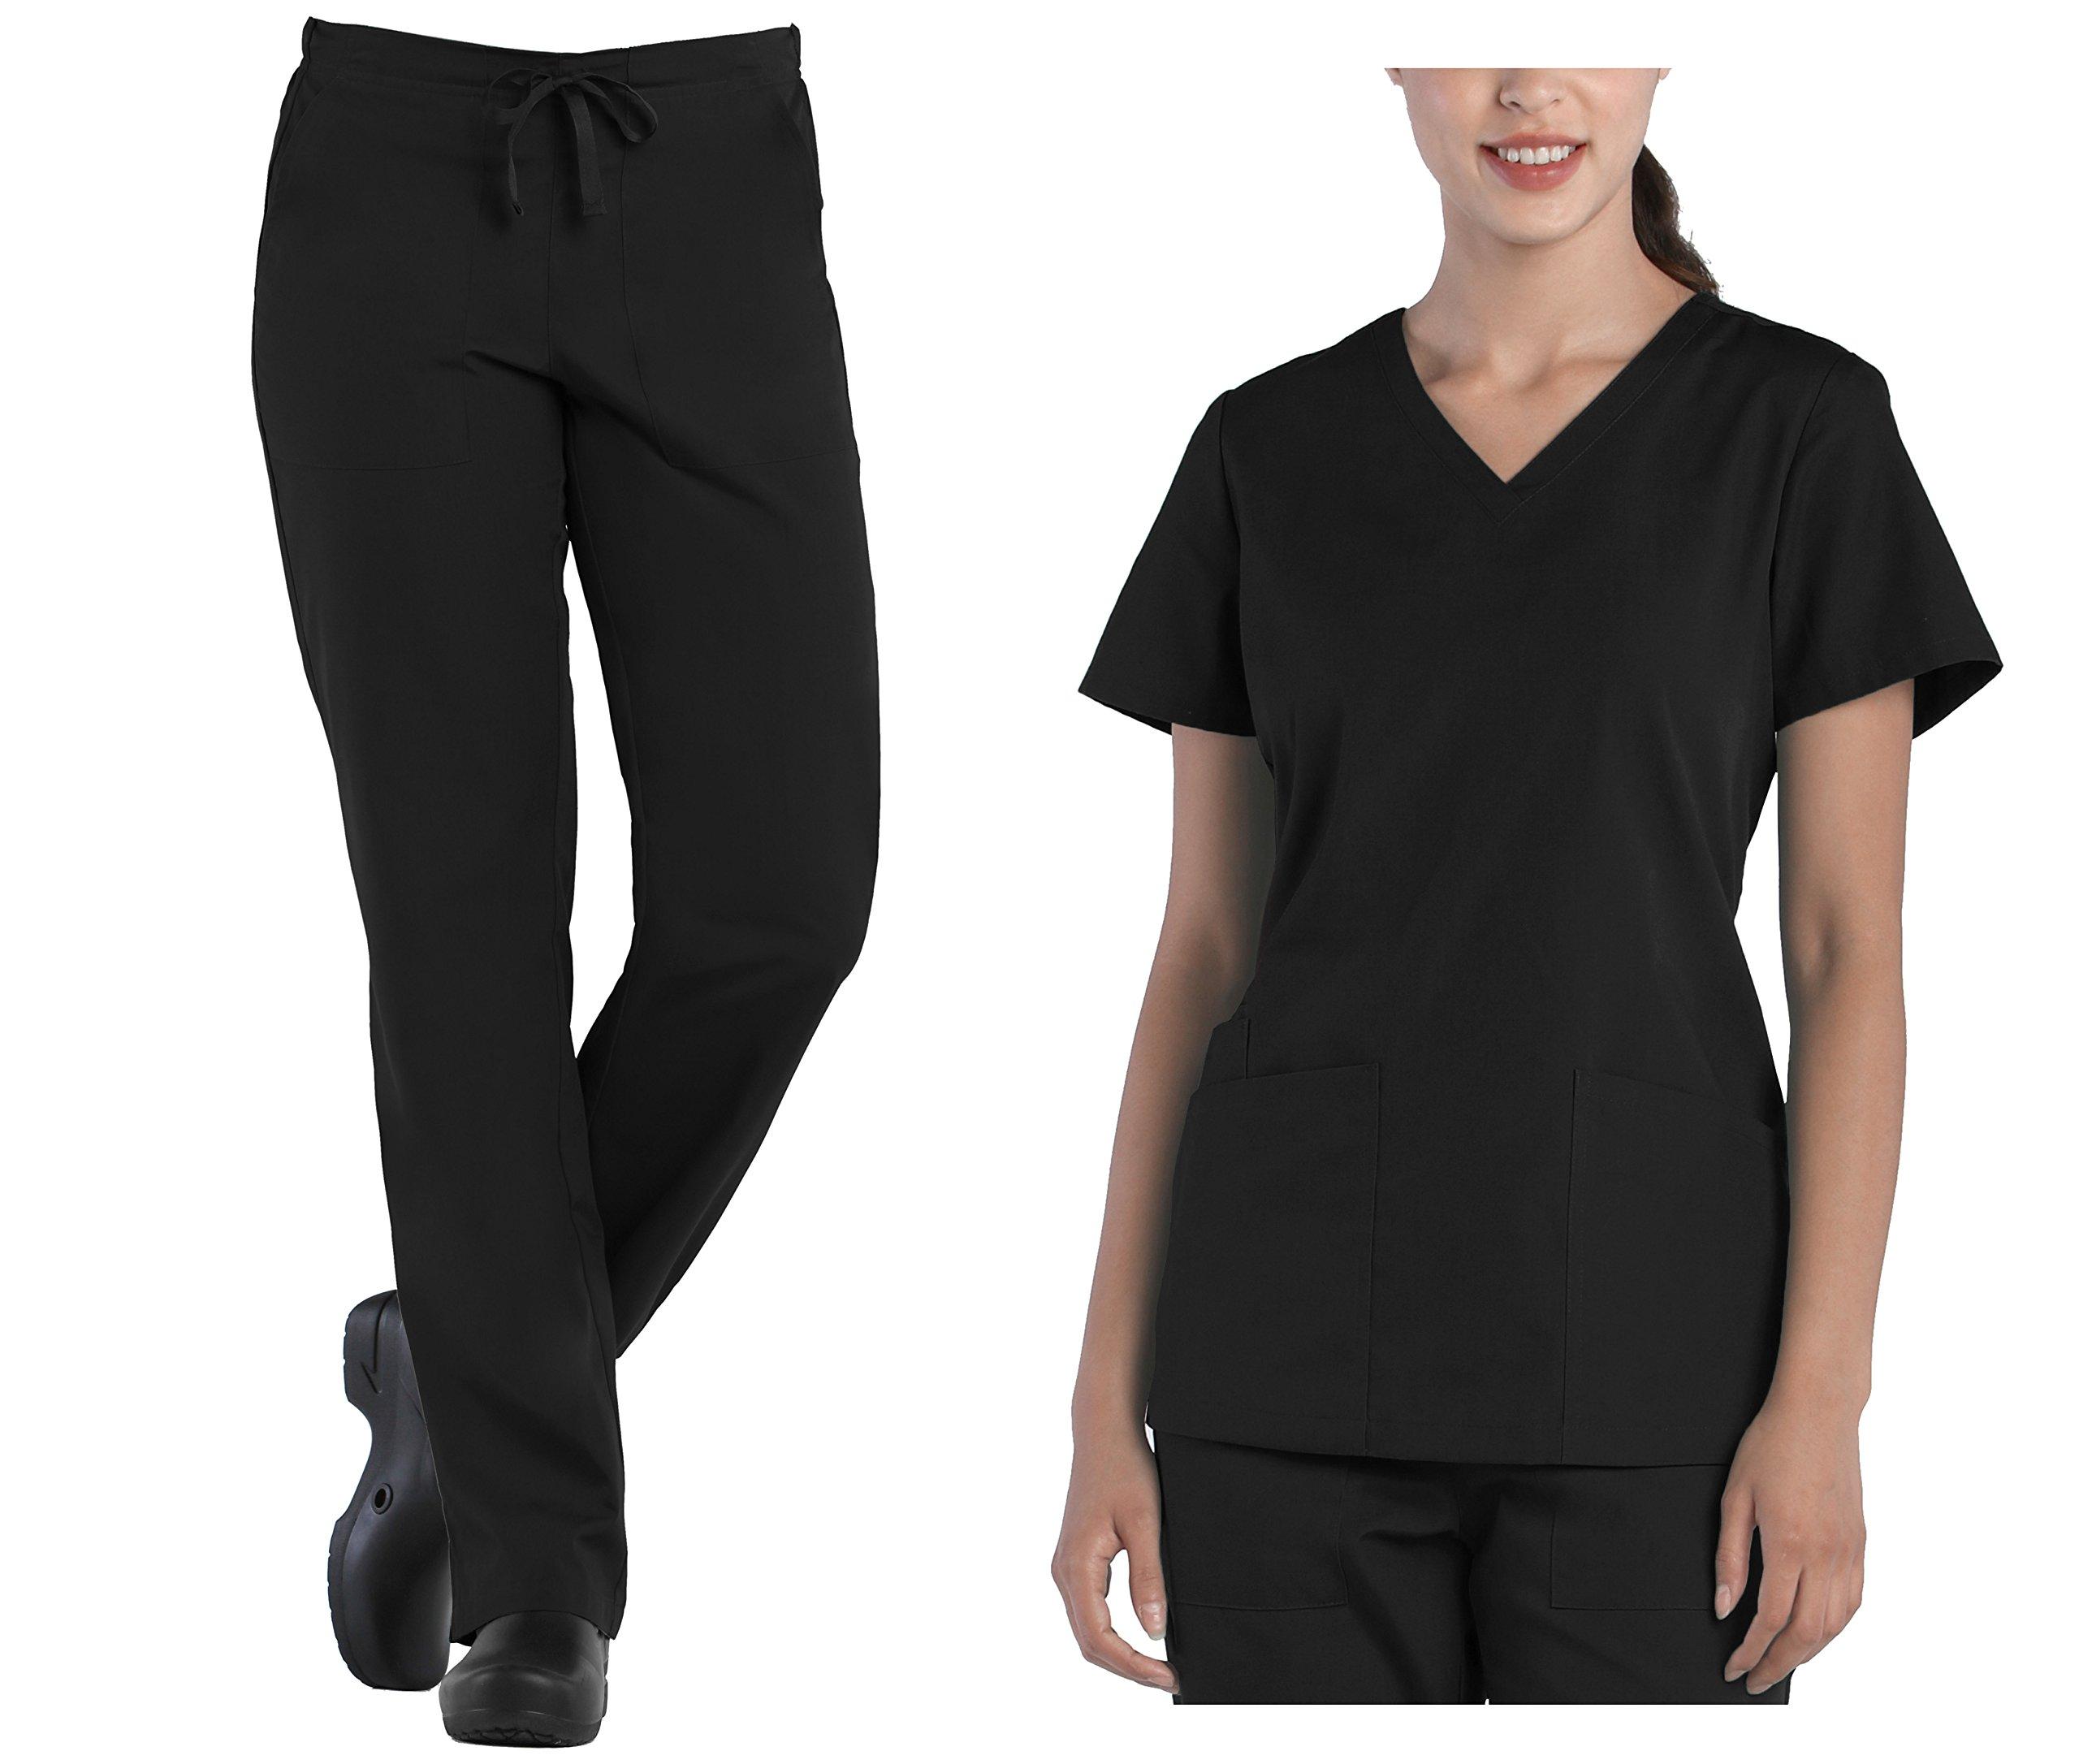 Tru Scrubs Ladies V-Neck Top & Drawstring Half Elastic Pant Scrub Set (Small, Black)